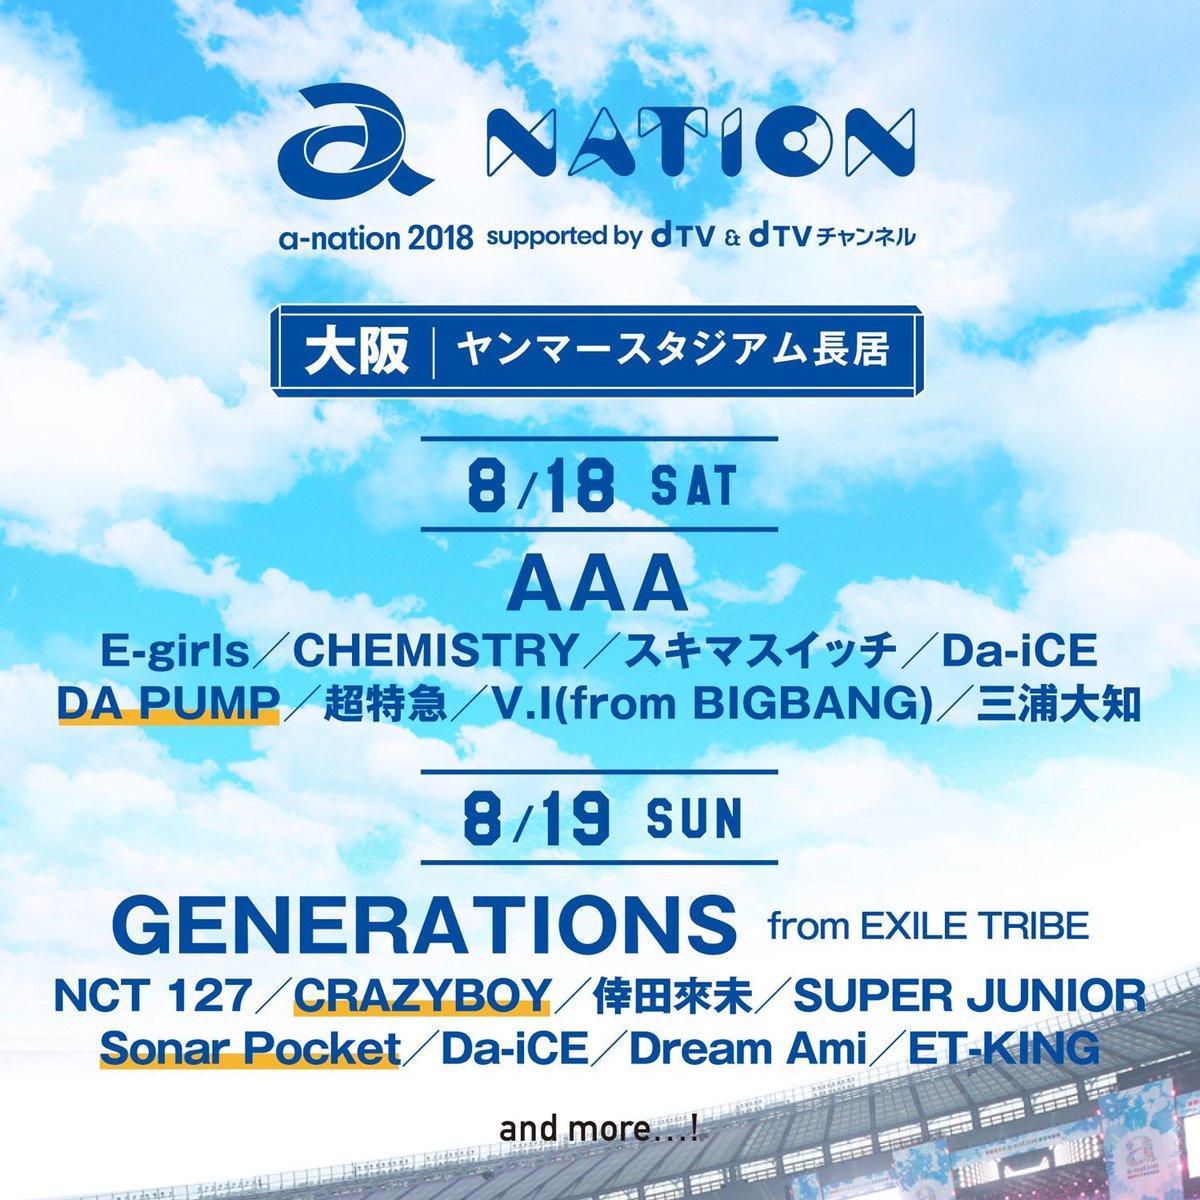 test ツイッターメディア - 【拡散希望】 8/19 a-nation 2018 大阪 「LDH」特別抽選先行 2連 定価+手数料でお譲りします。 チケット当日手渡し  GENERATIONS、NCT127、CRAZY BOY、倖田來未、SUPERJUNIOR、Sonar Pocket、Da-iCE、Dream Ami、ET-KING #GENERATIONS#GENERATIONS from EXILE TRIBE https://t.co/BxTcqXn6JD